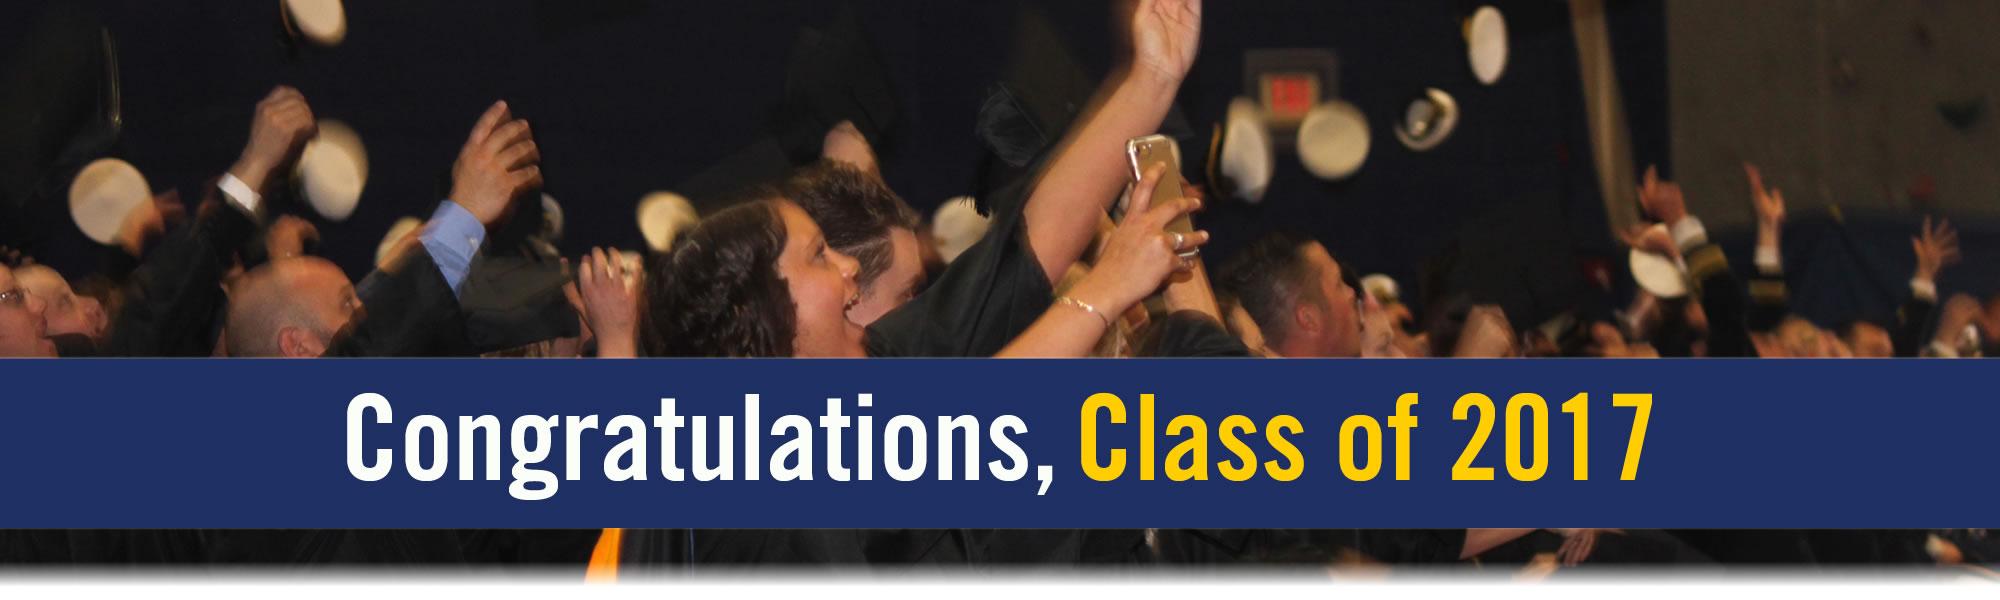 Congfratulations Class of 2017